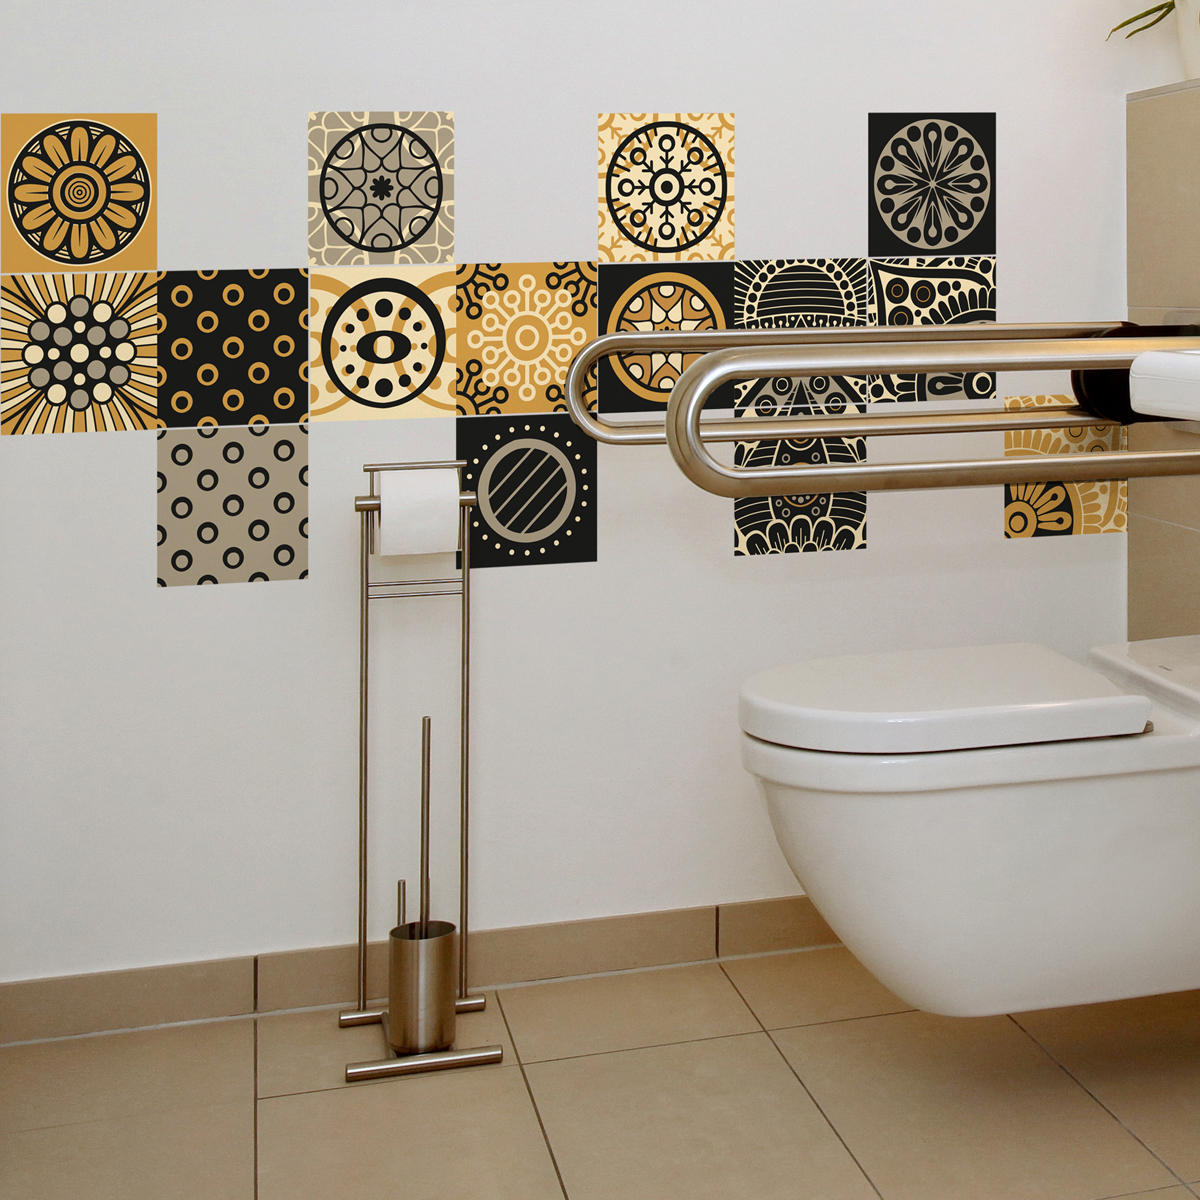 15 stickers carrelages azulejos san juan salle de bain - Stickers pour carreaux salle de bain ...